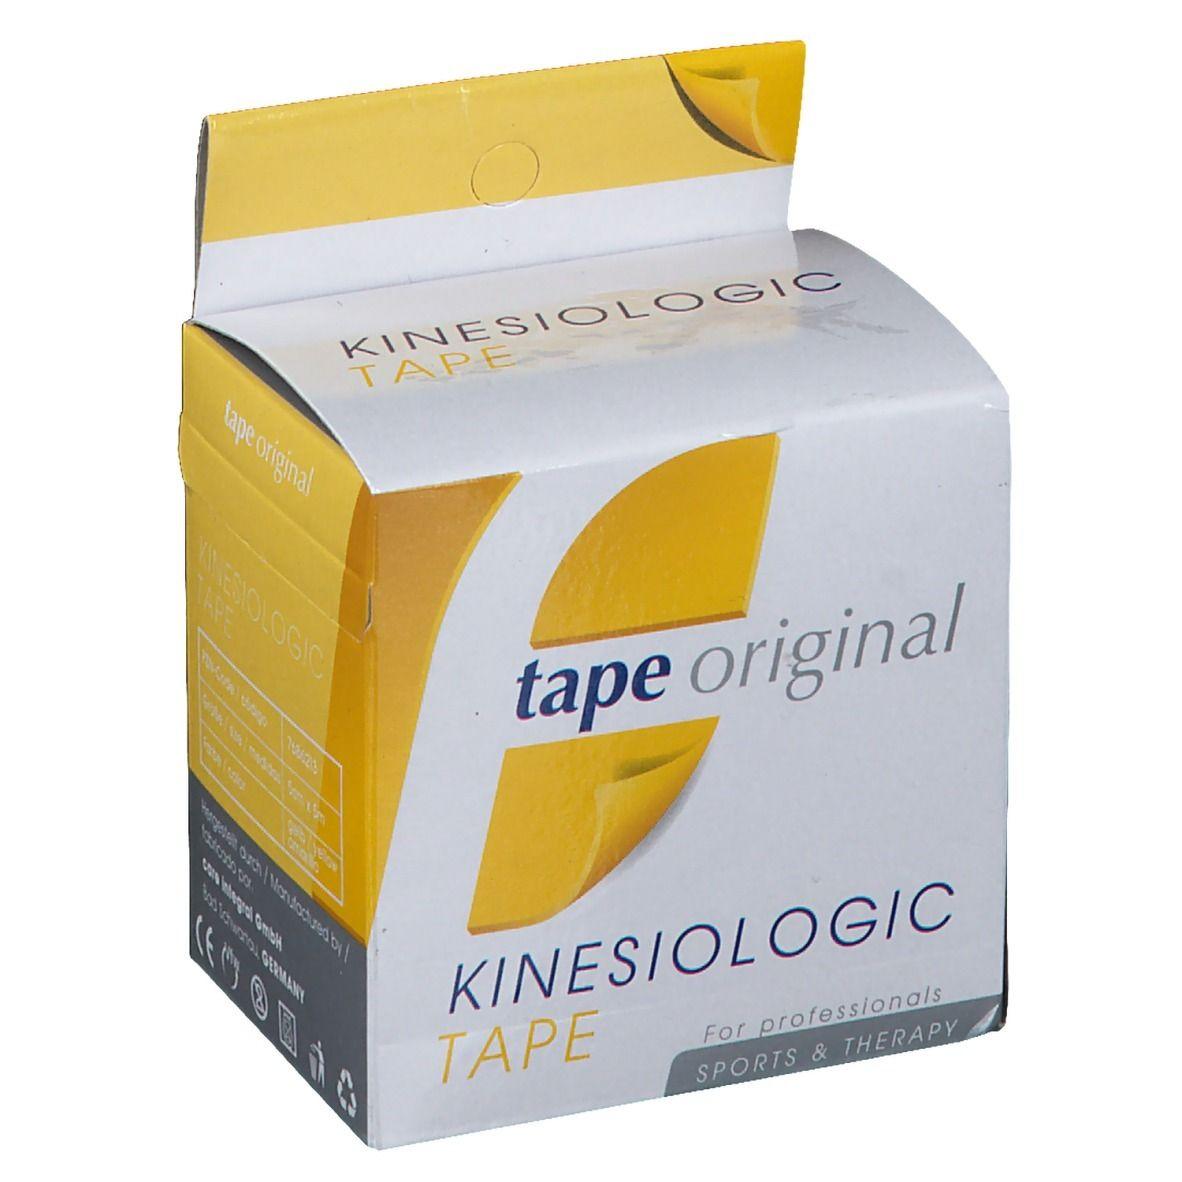 Kinesio tape original Kinesiologic Tape gelb 5 cm x 5 m